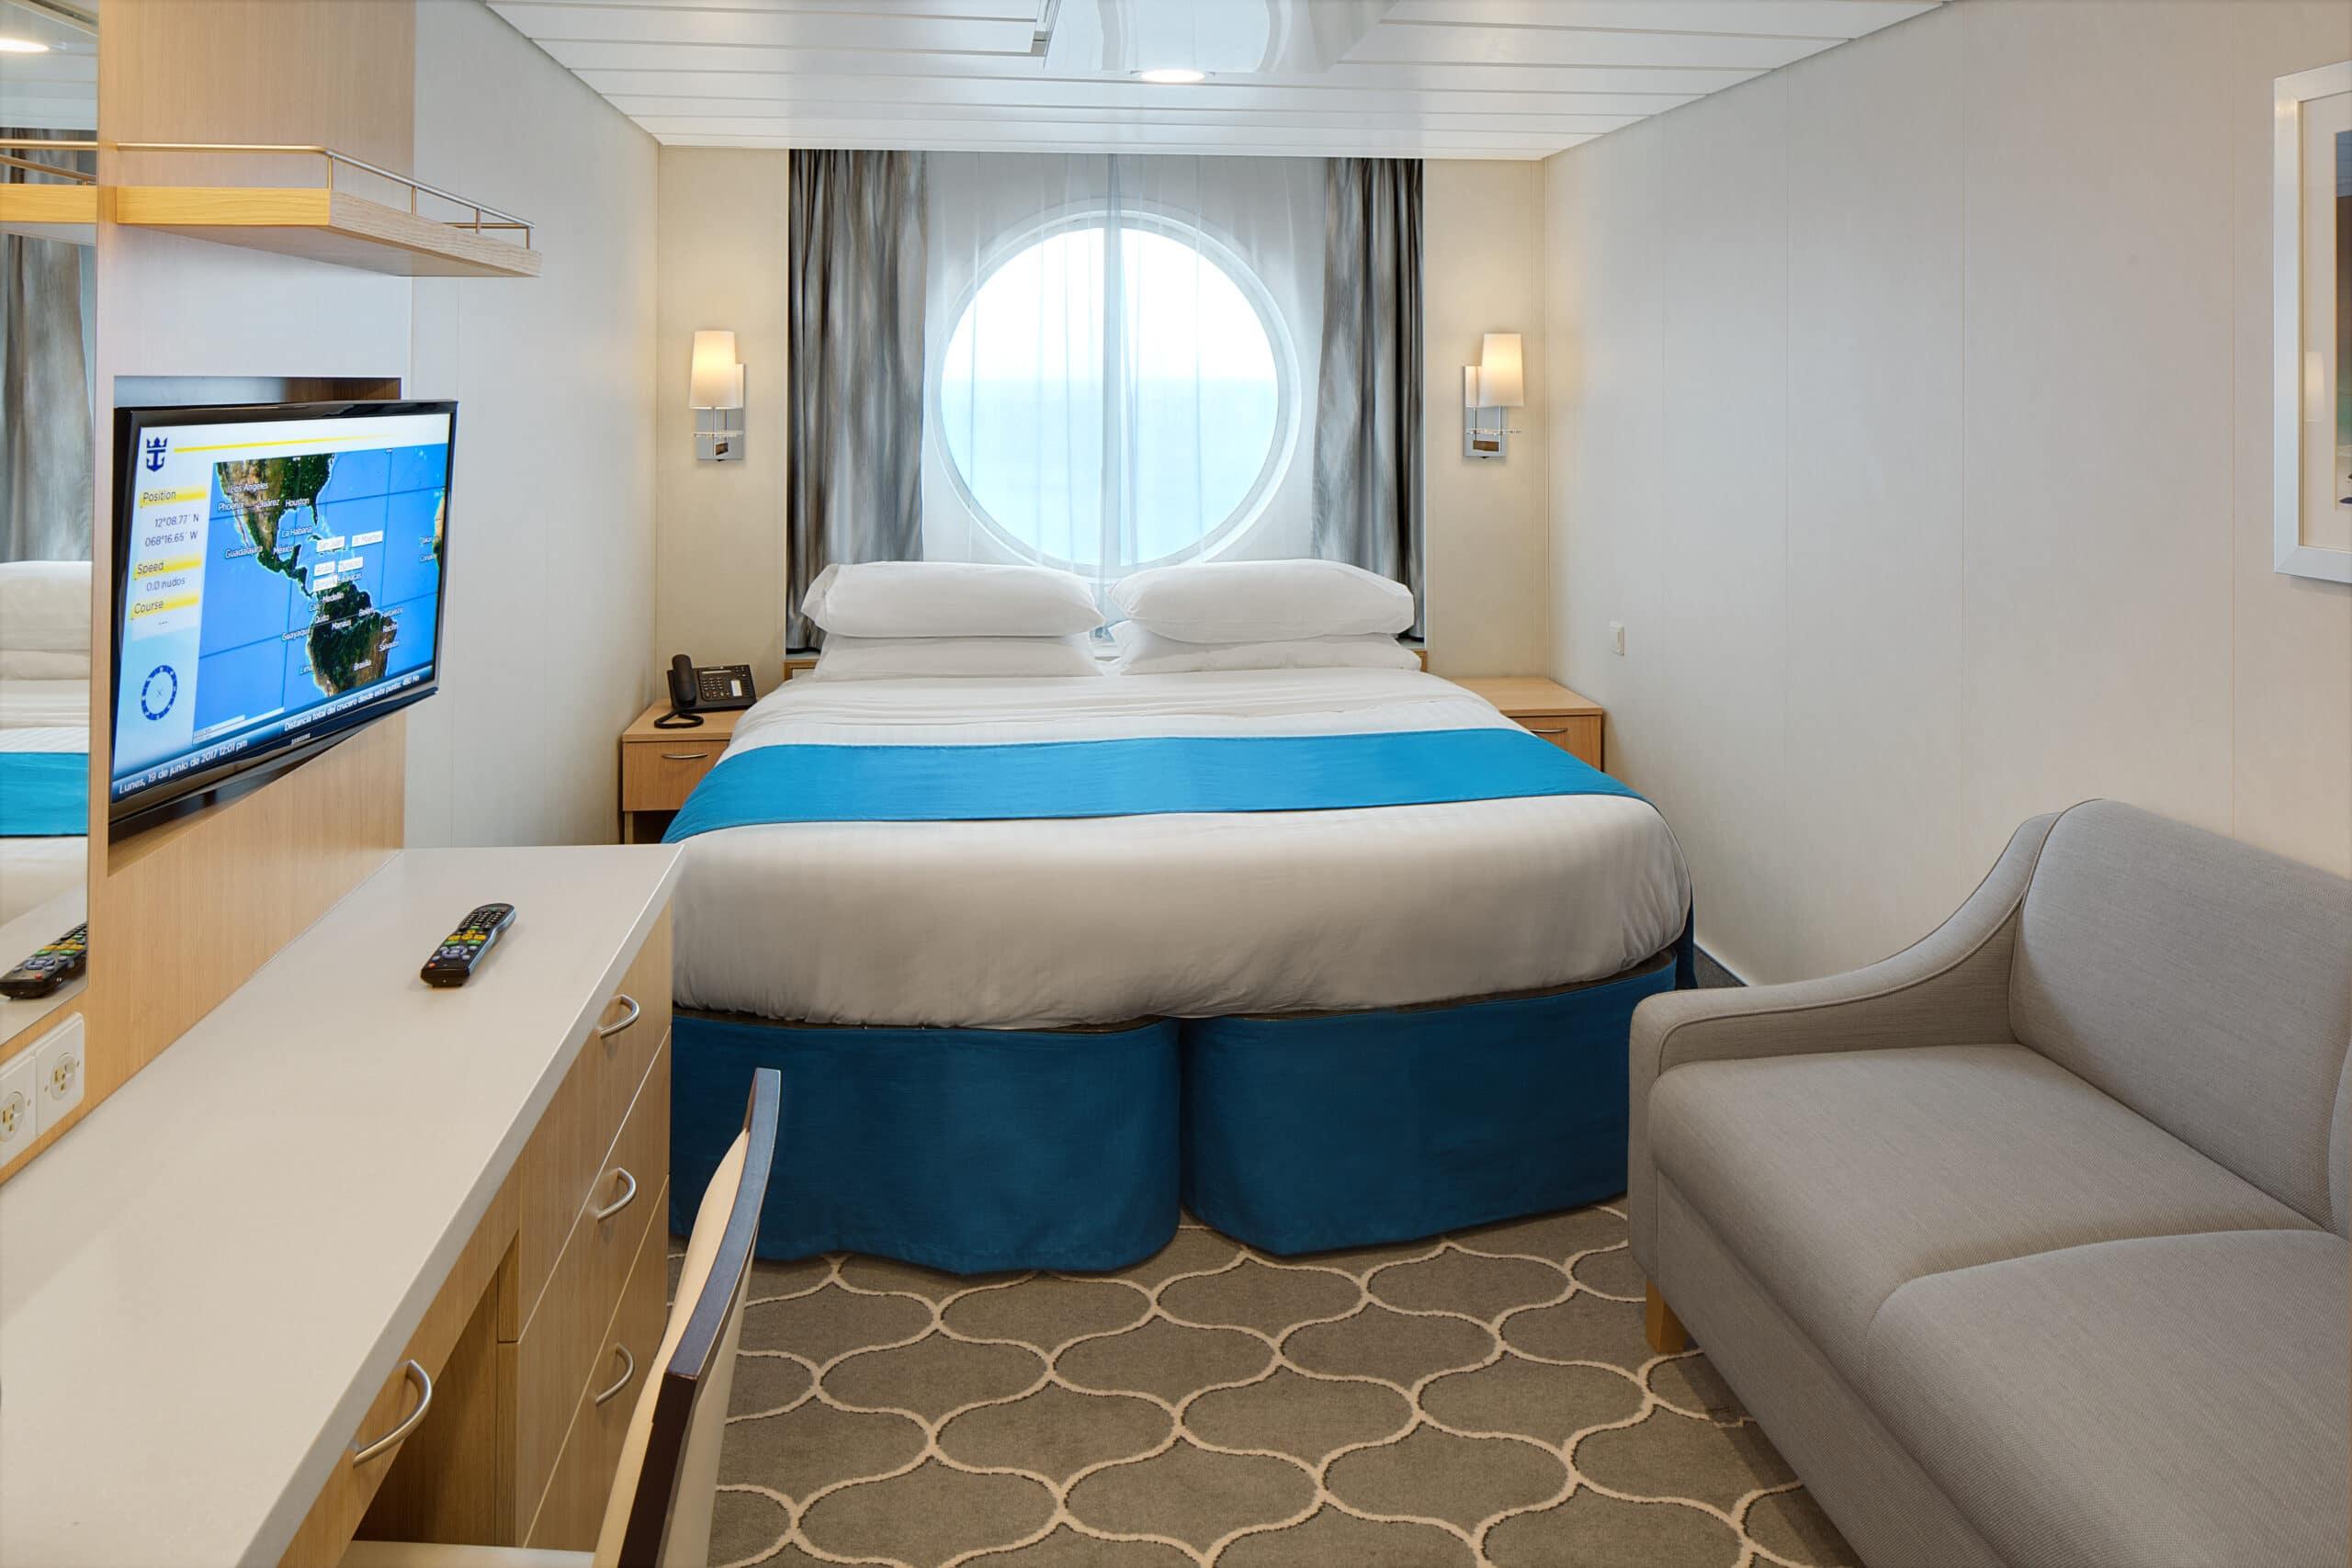 Royal-Caribbean-International-Adventure-of-the-Seas-schip-cruiseschip-categorie-1N-2N-3N-8N-buitenhut